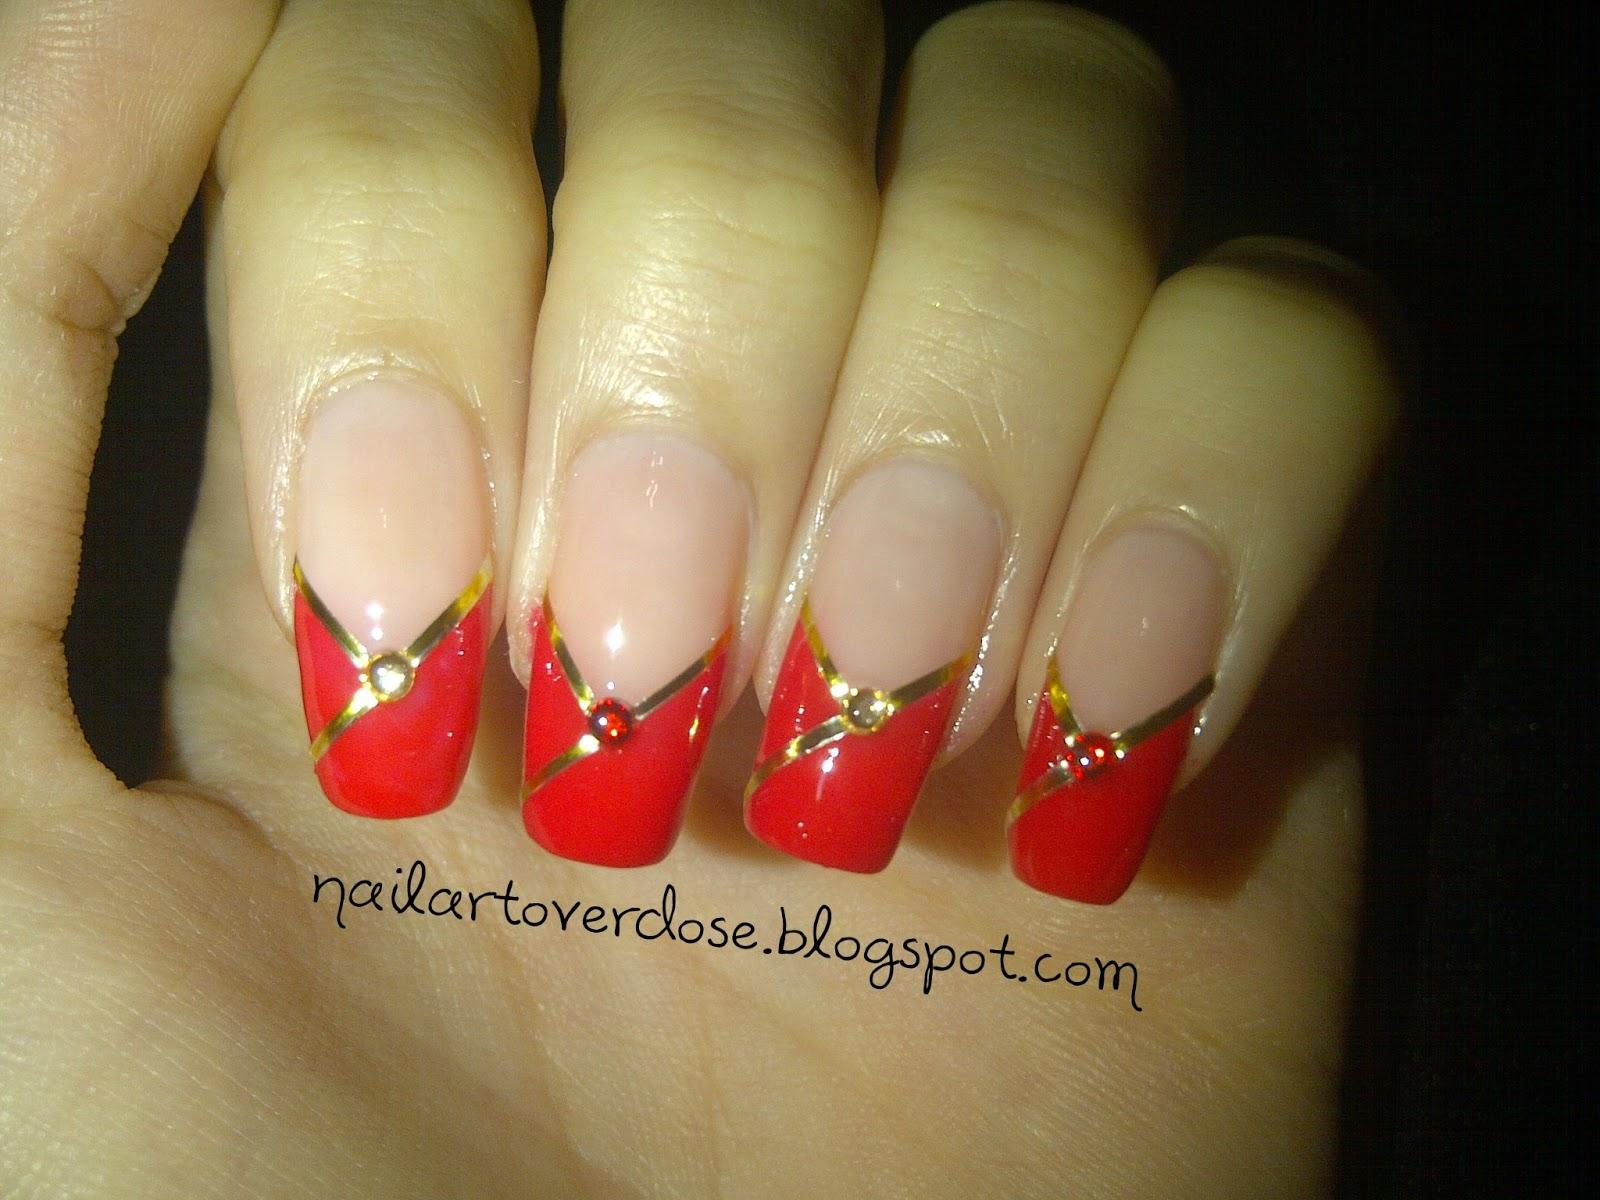 New Years Nail Designs For Short Nails: The polish well nail ideas ...